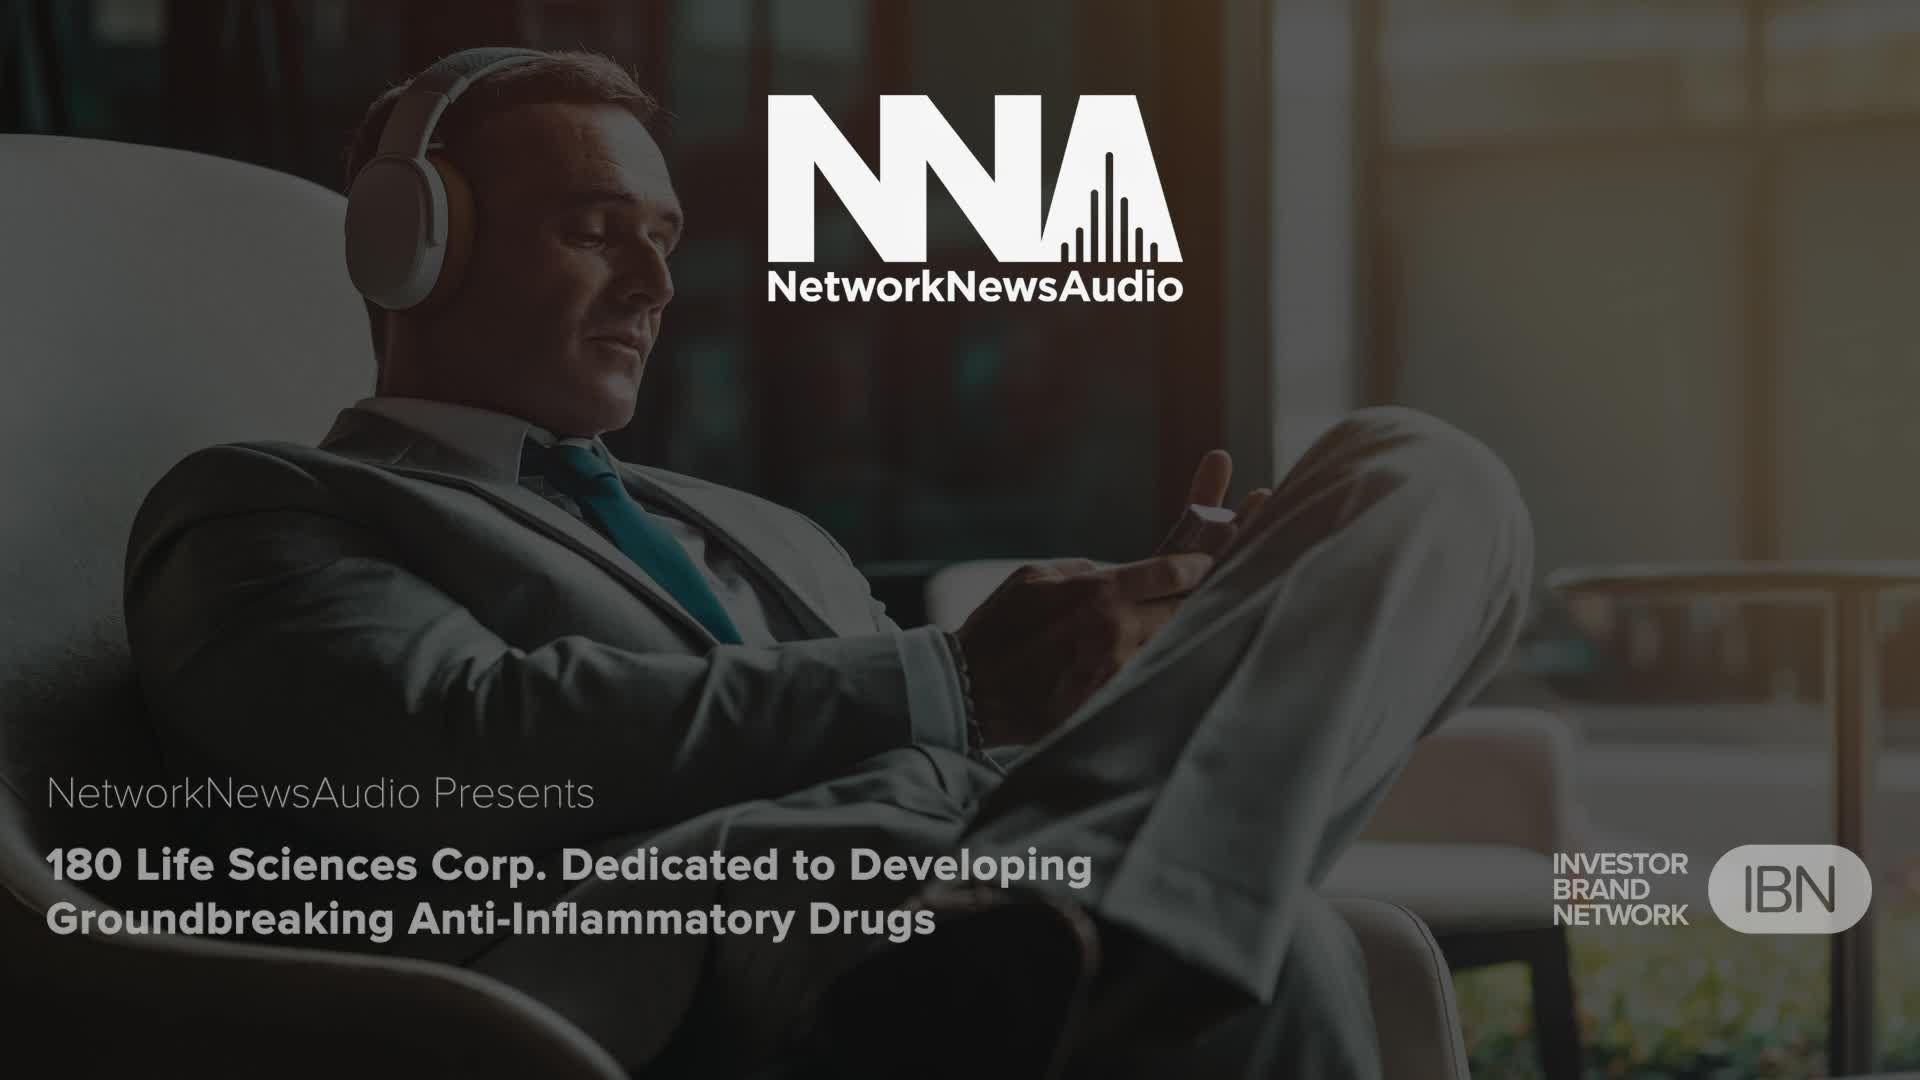 NetworkNewsAudio News-180 Life Sciences Corp. Dedicated to Developing Groundbreaking Anti-Inflammatory Drugs